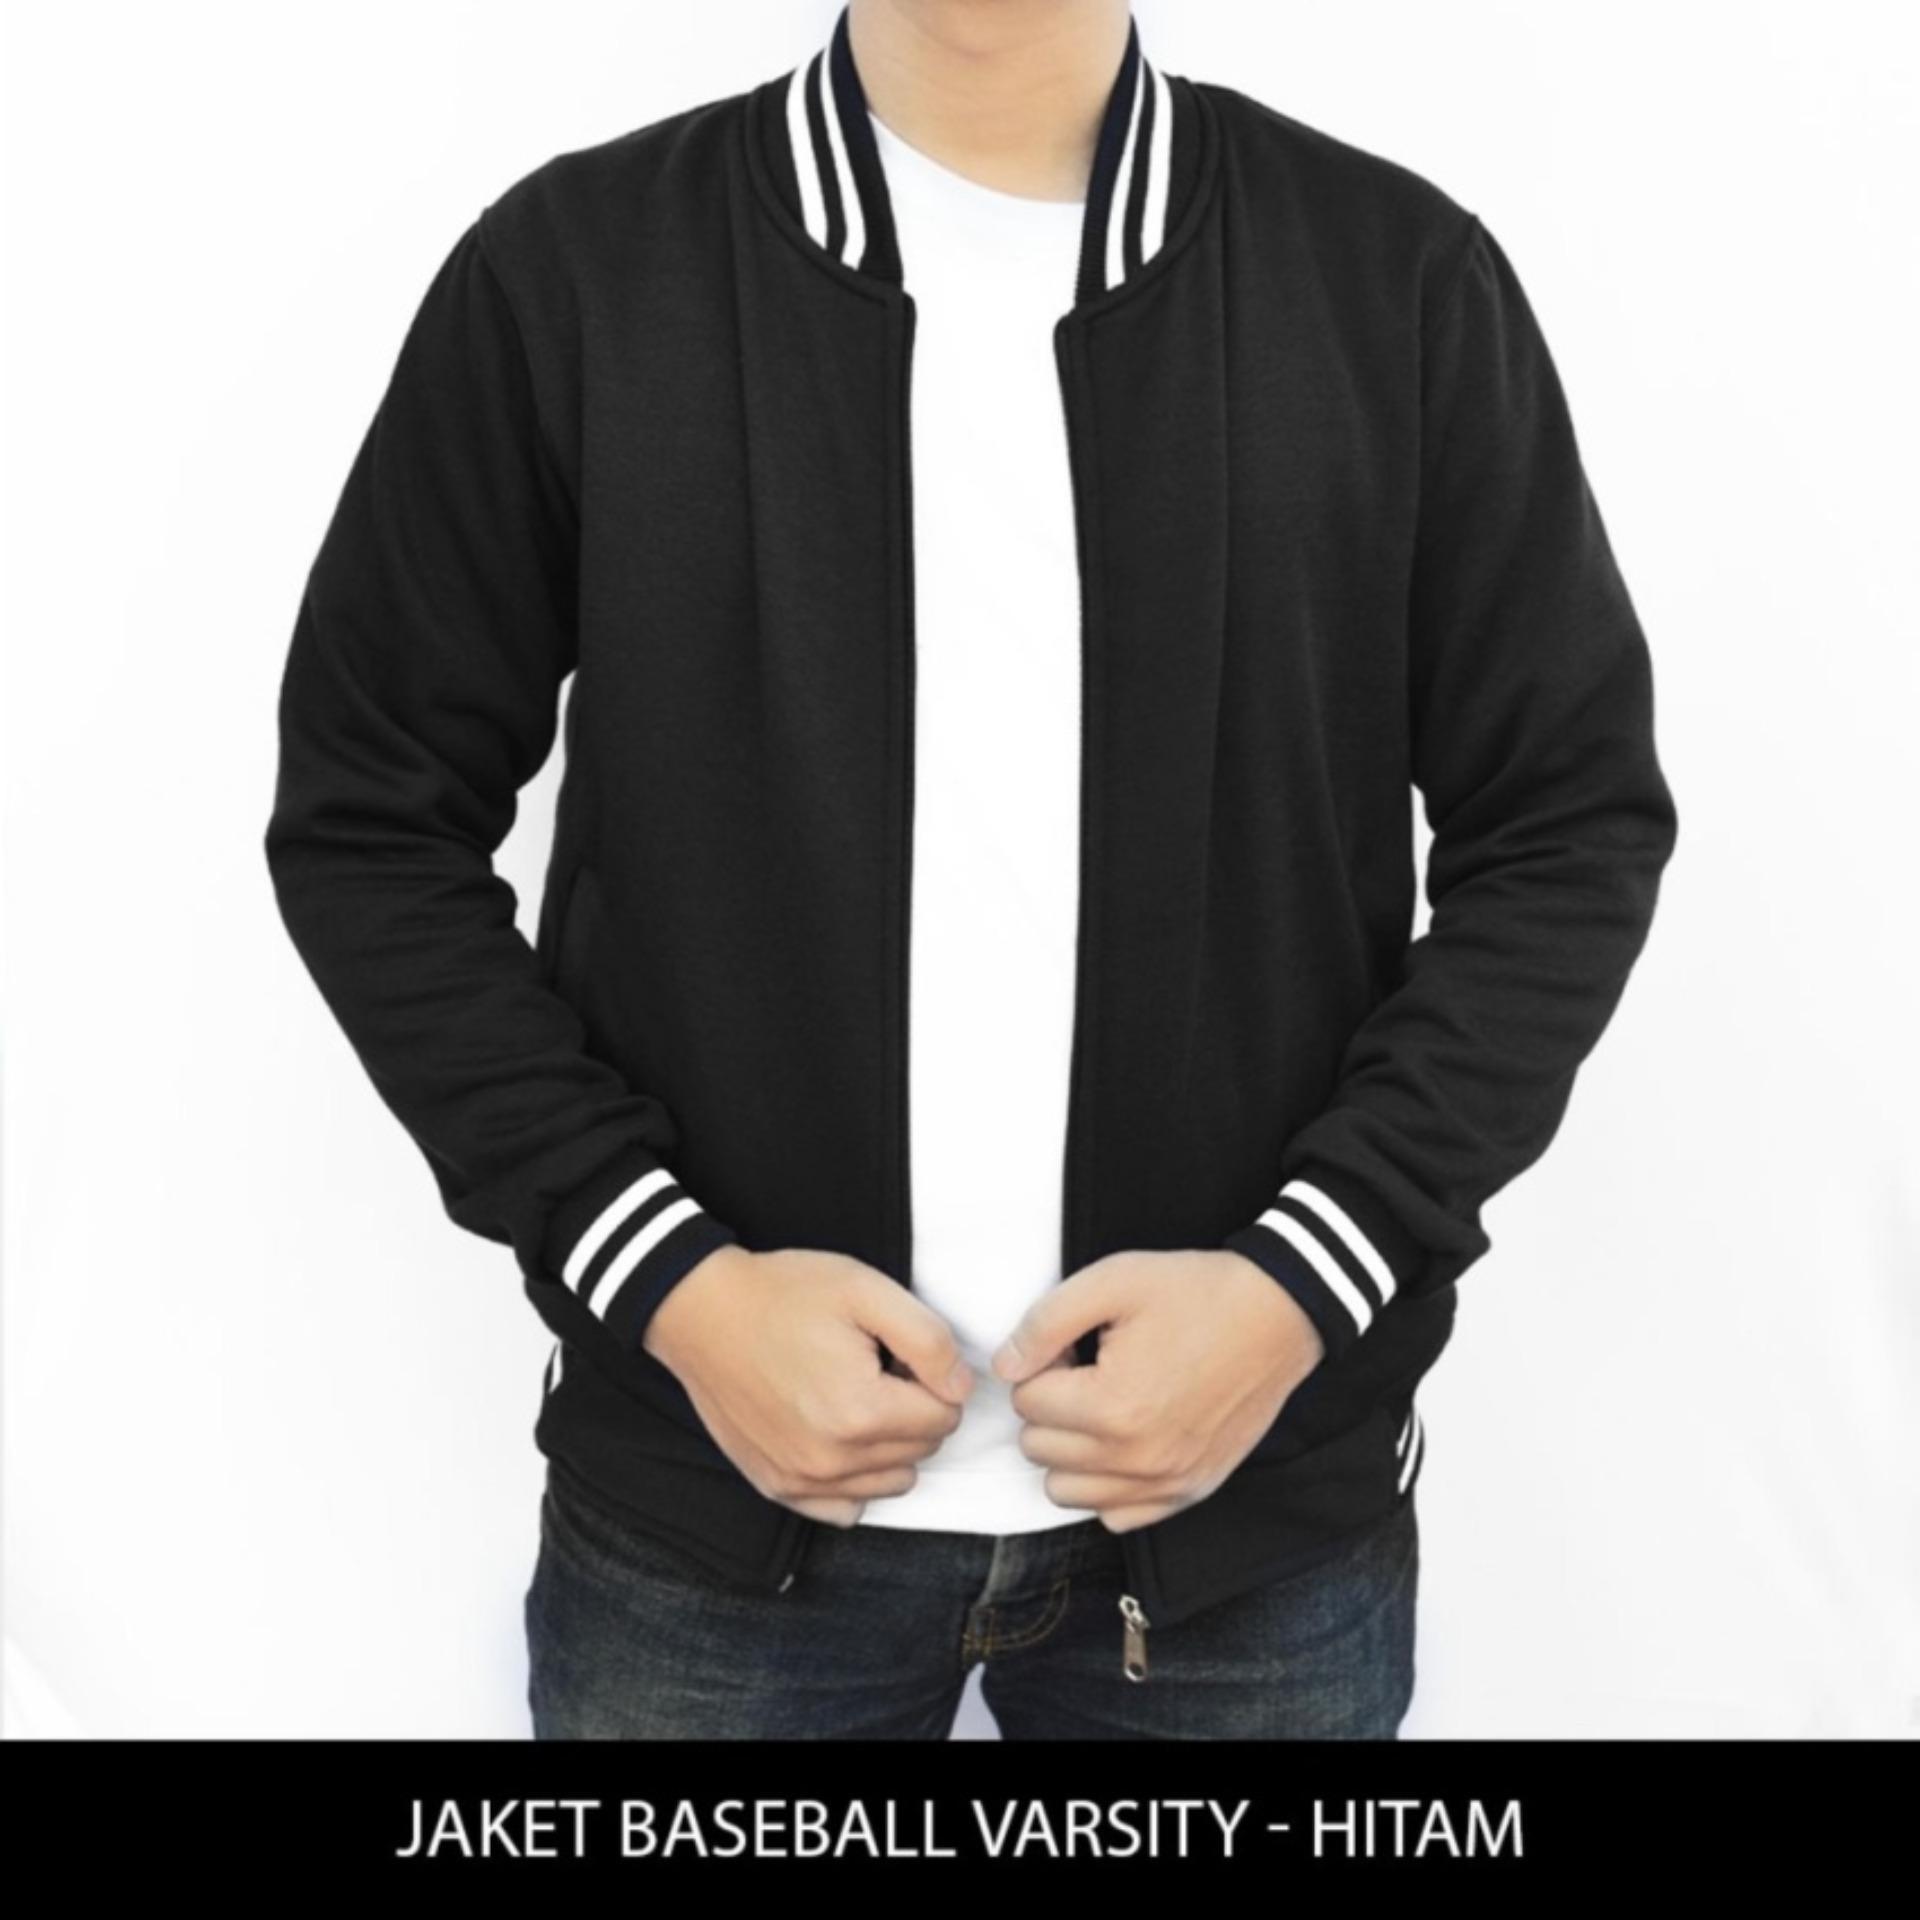 DONI STORE  Jaket Baseball Varsity Polos - Hitam